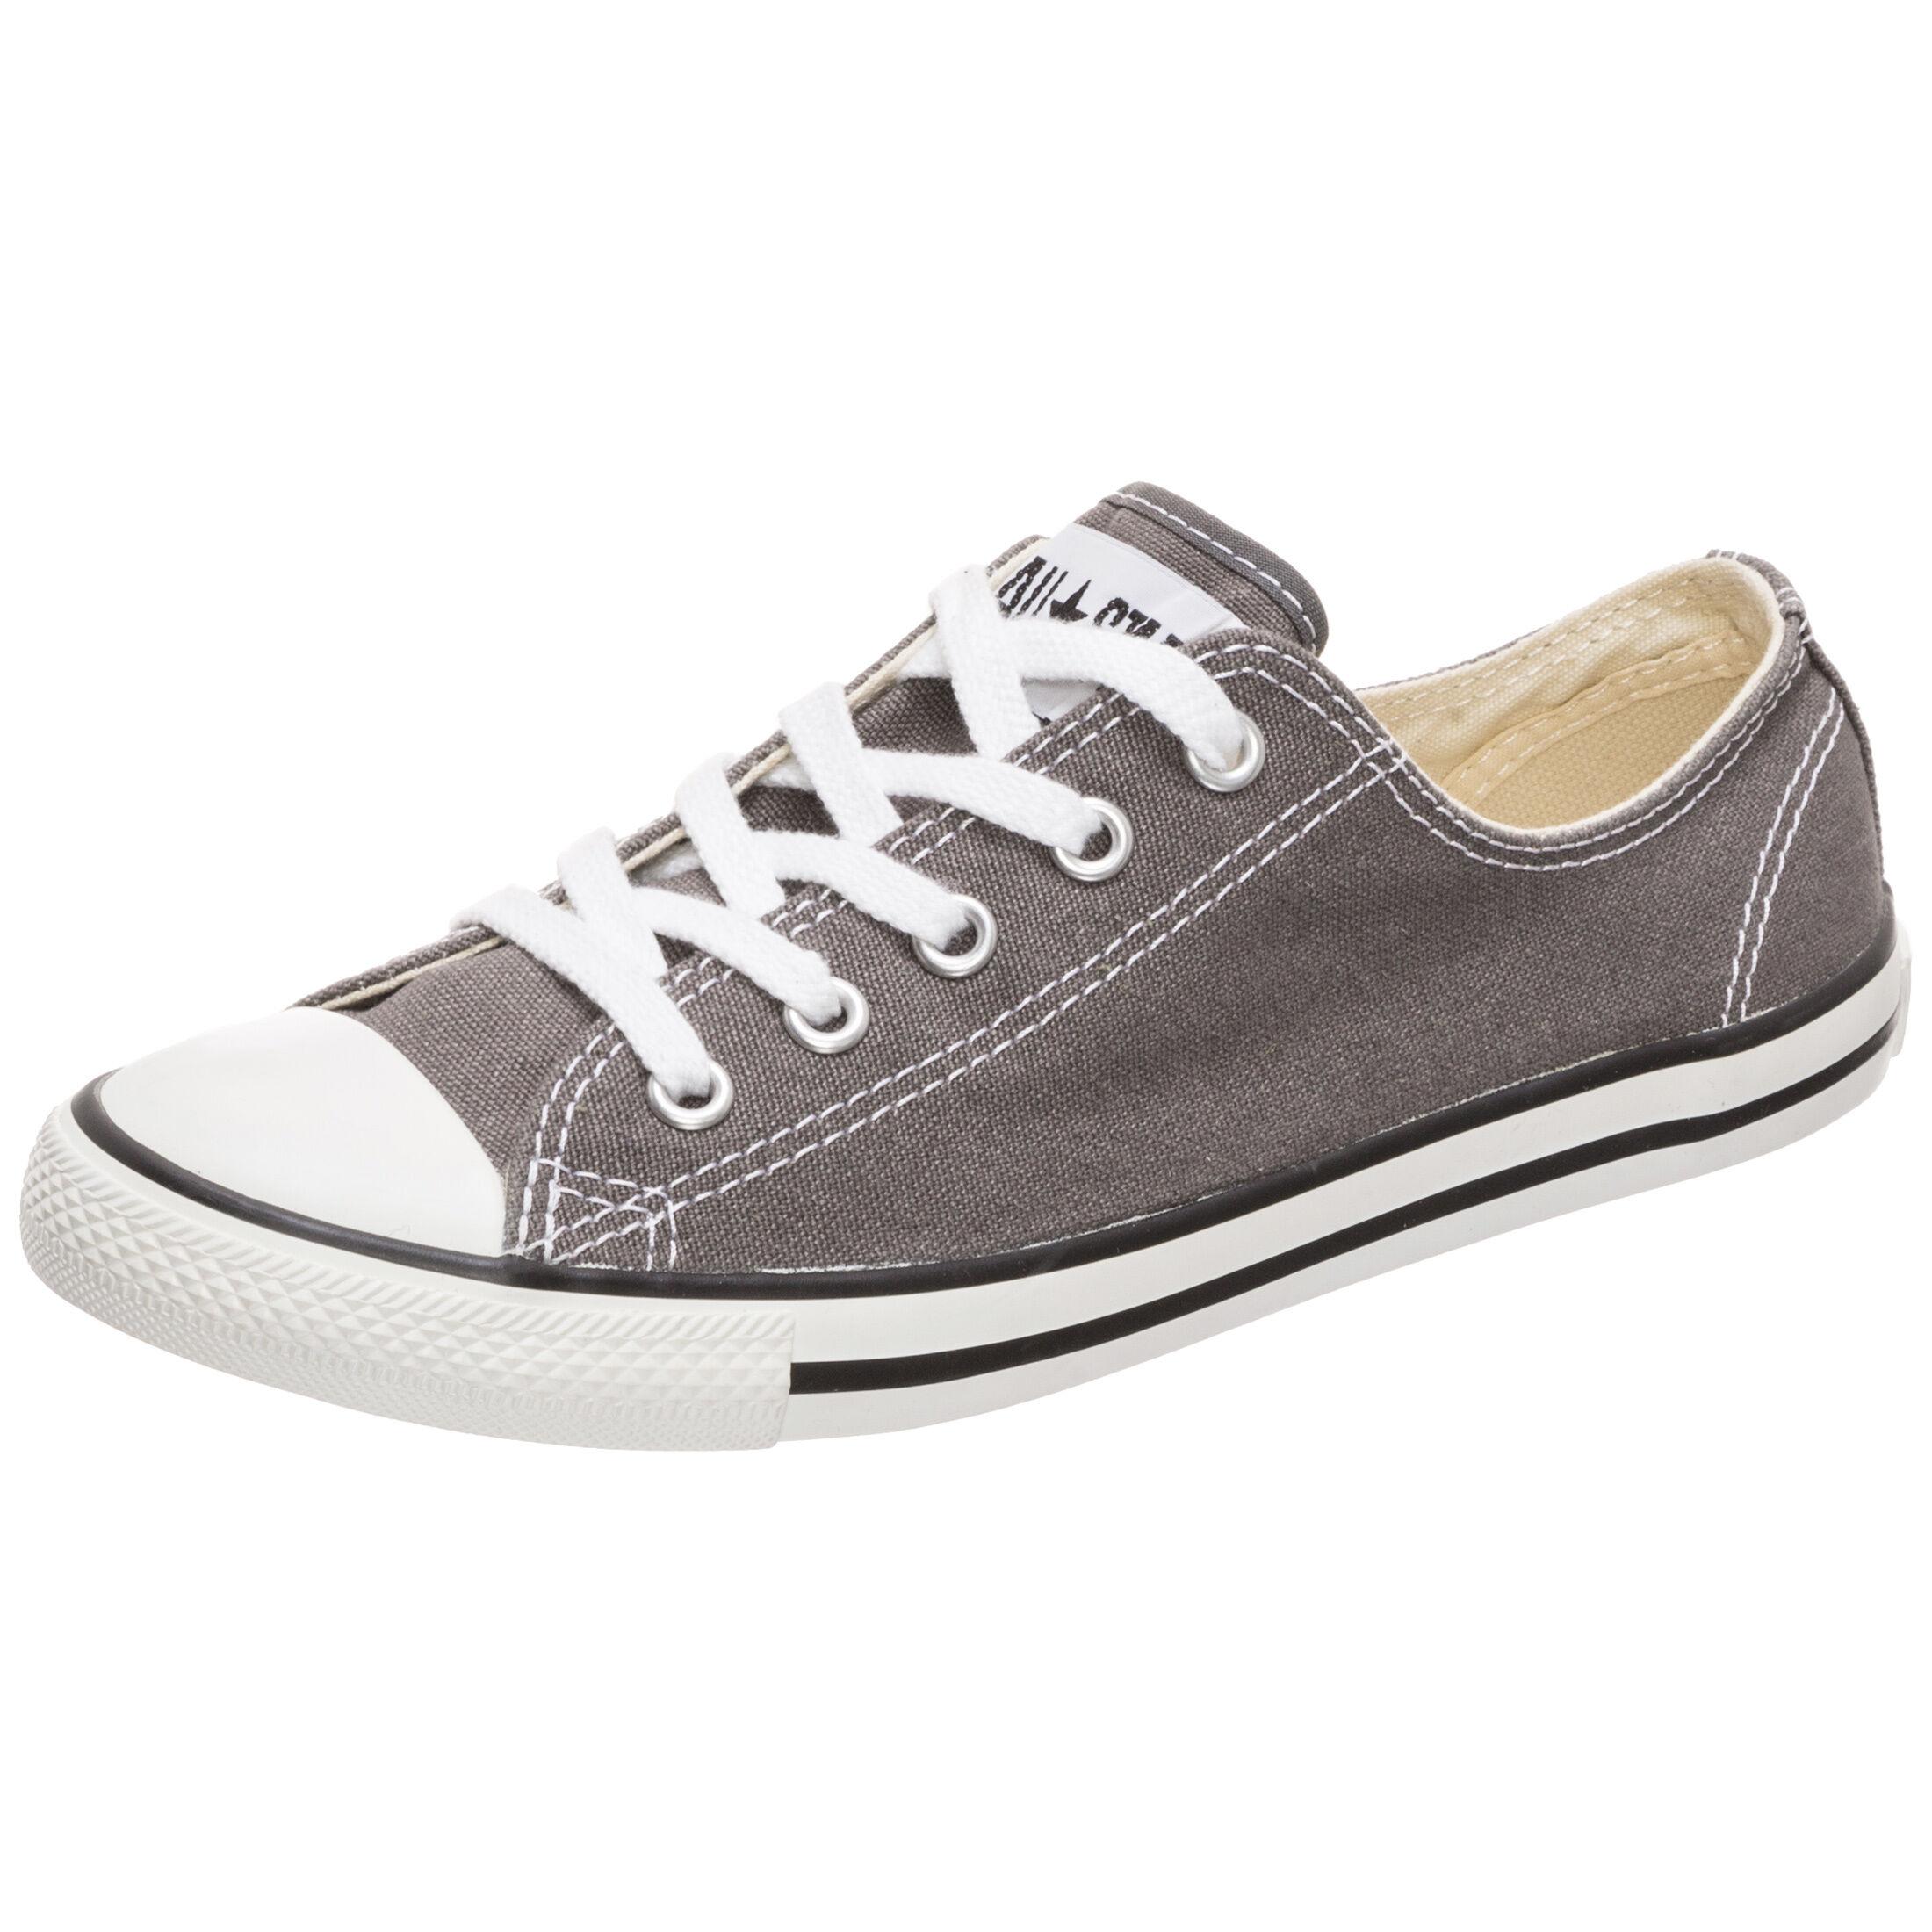 Chuck Taylor All Star Dainty OX Sneaker Damen